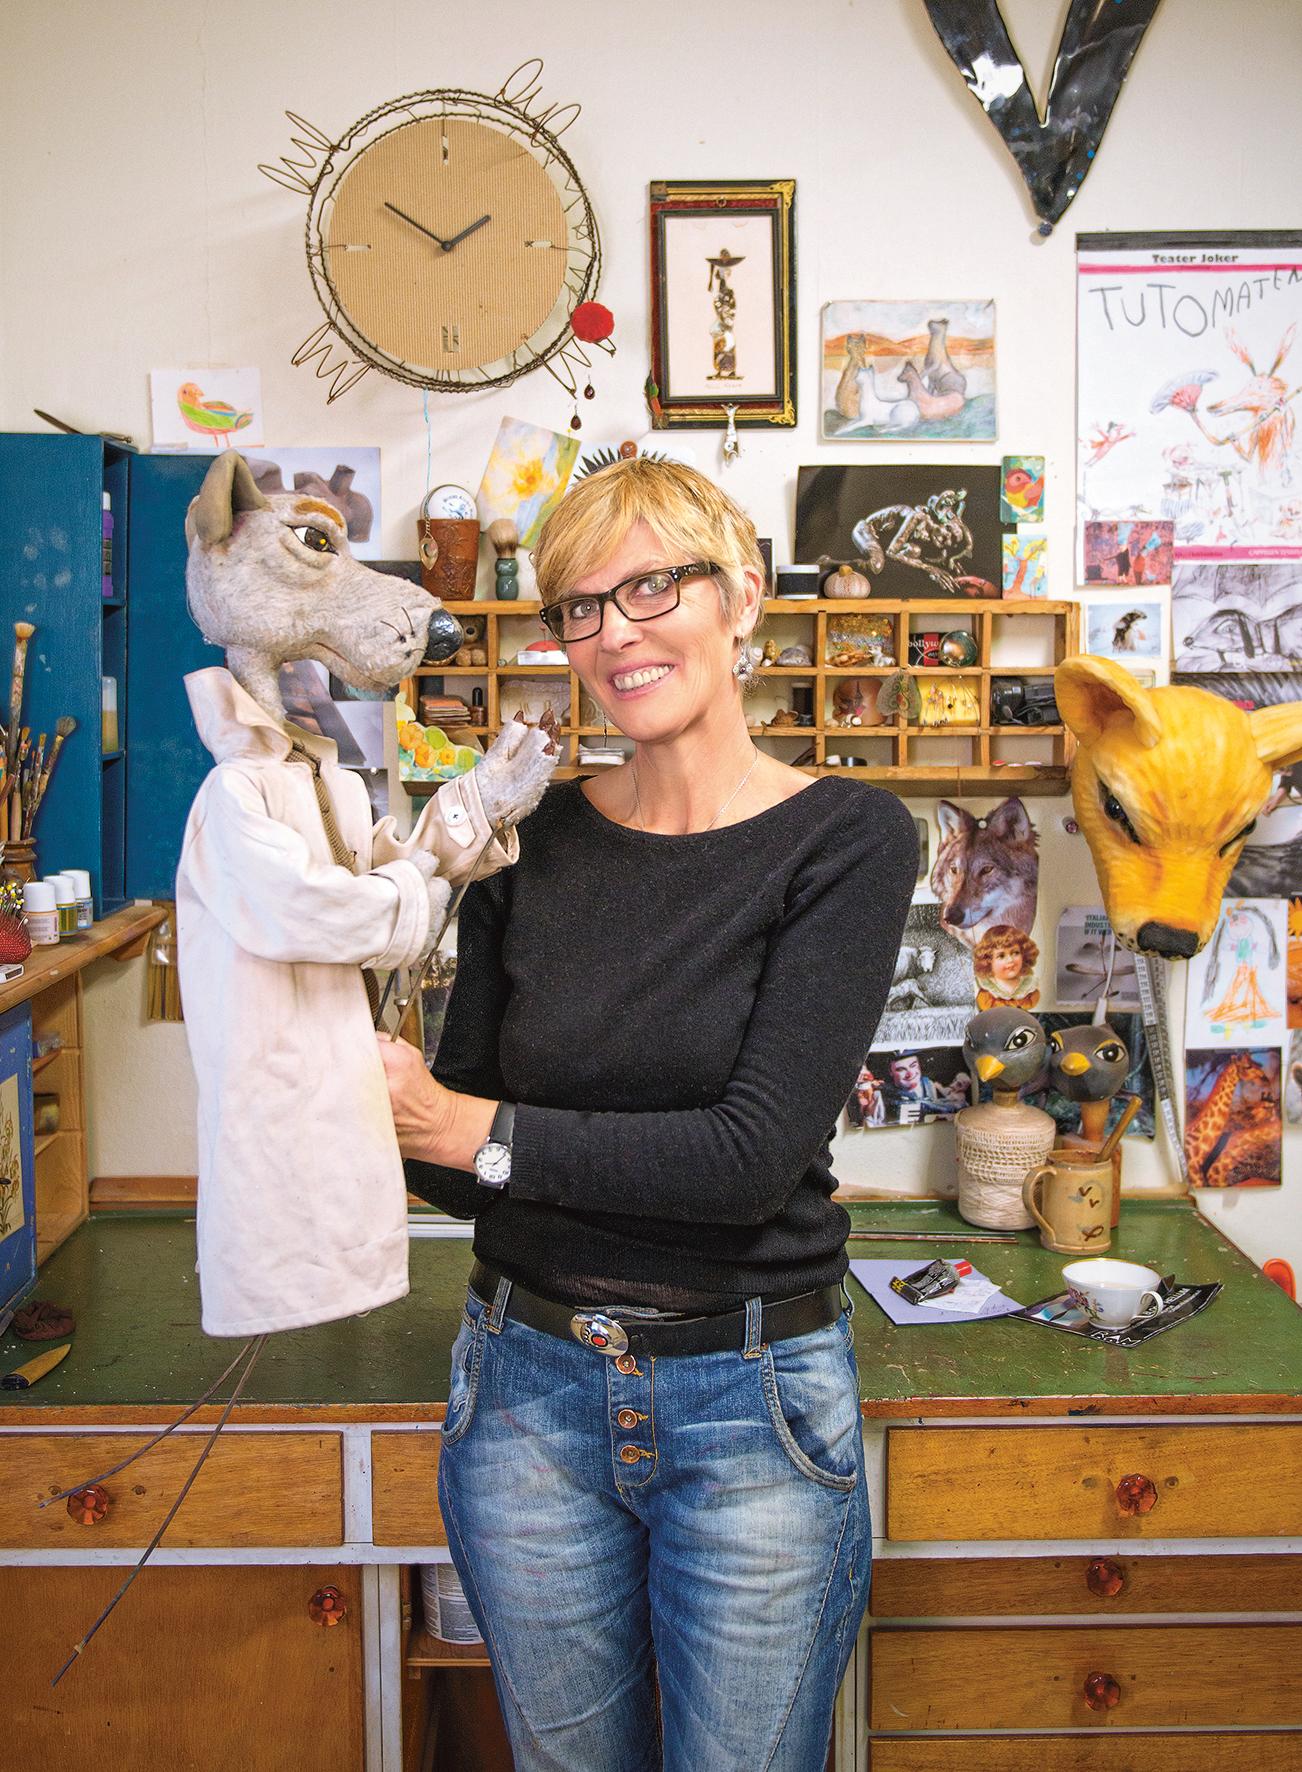 Dukkemaker Kari Noreger. Foto: Andreas Melgård.